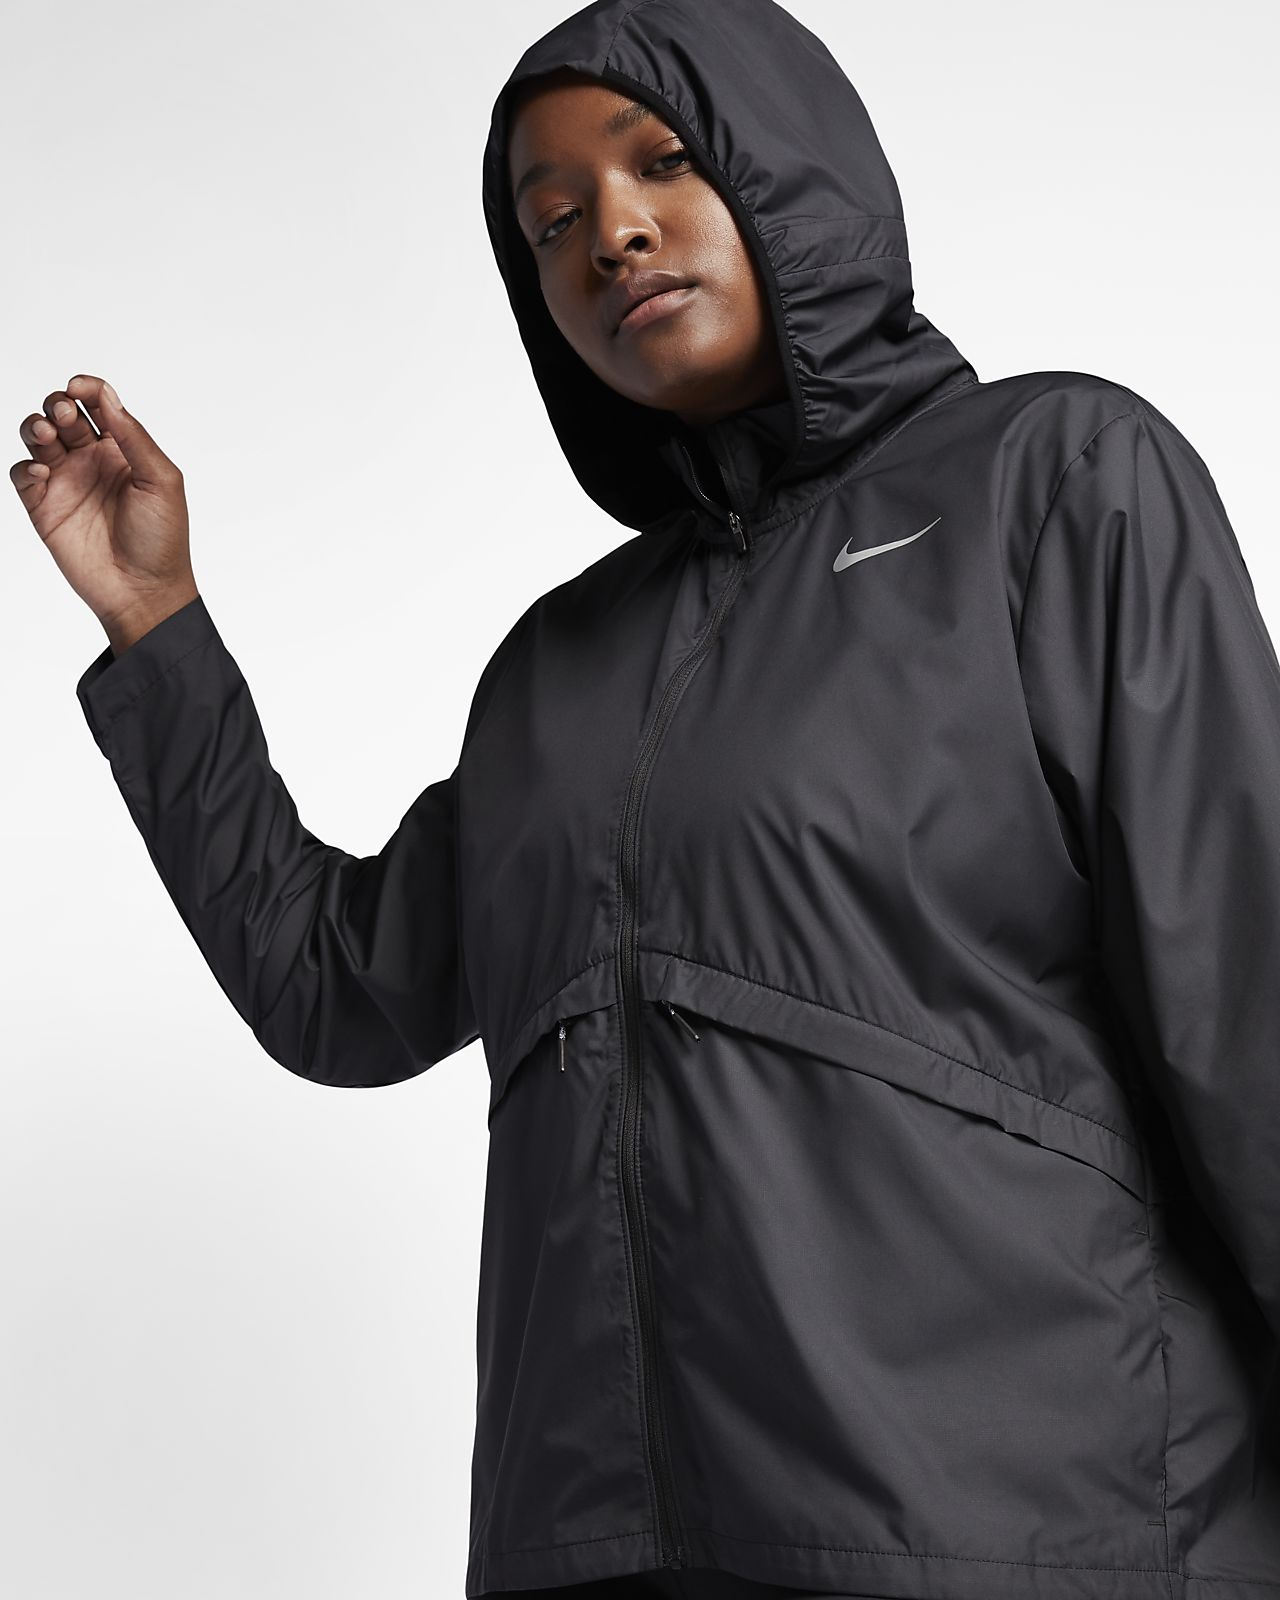 d5a8cbf3 Женская беговая куртка Nike Essential (большие размеры). Nike.com RU